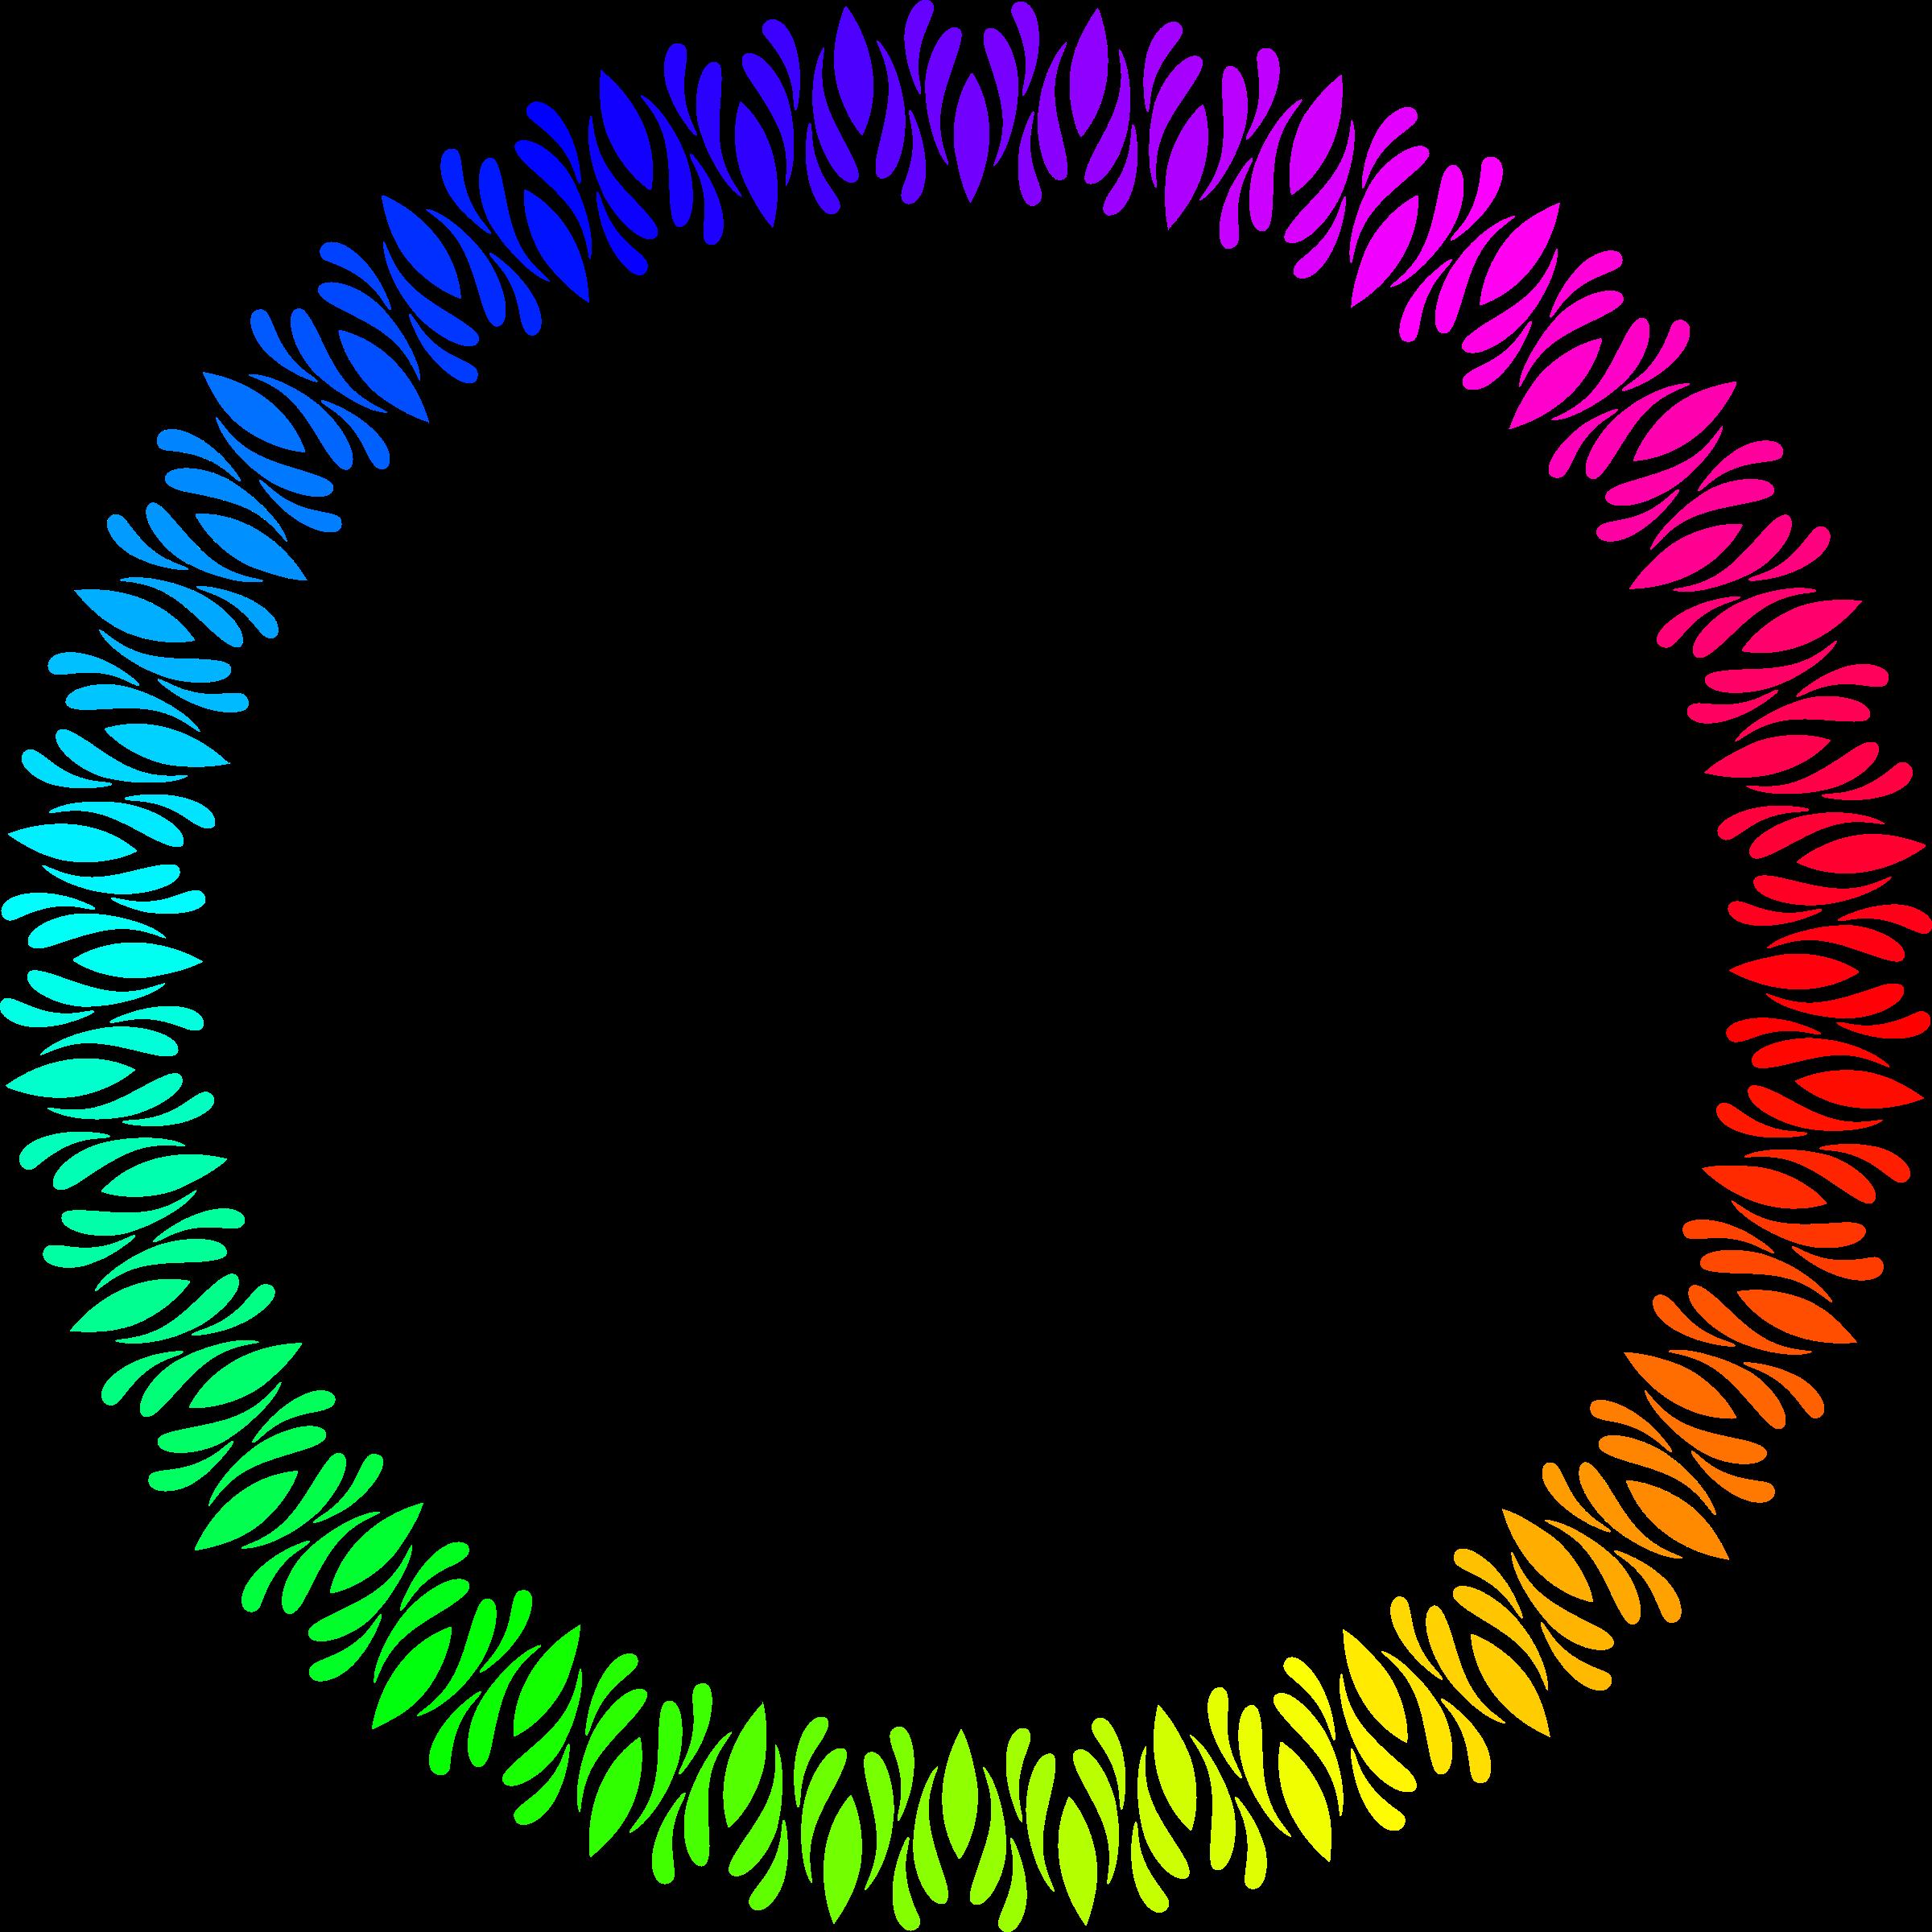 Clipart colour big image. Circular frame png